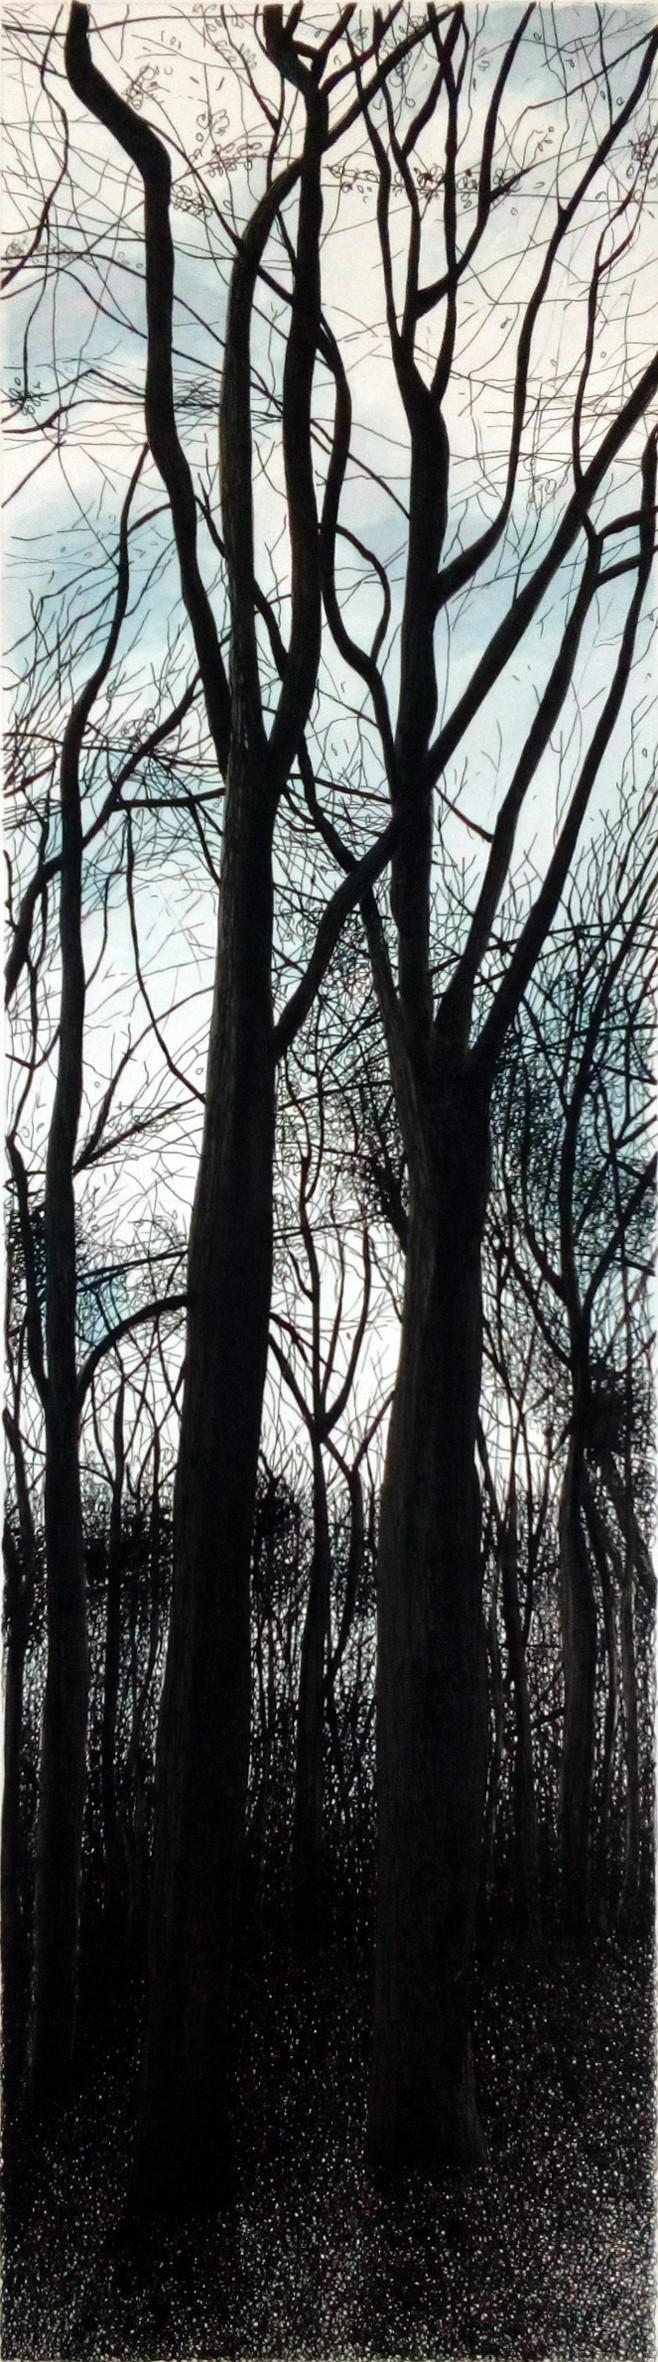 La forêt Colbert 4 (Michèle CARANOVE)